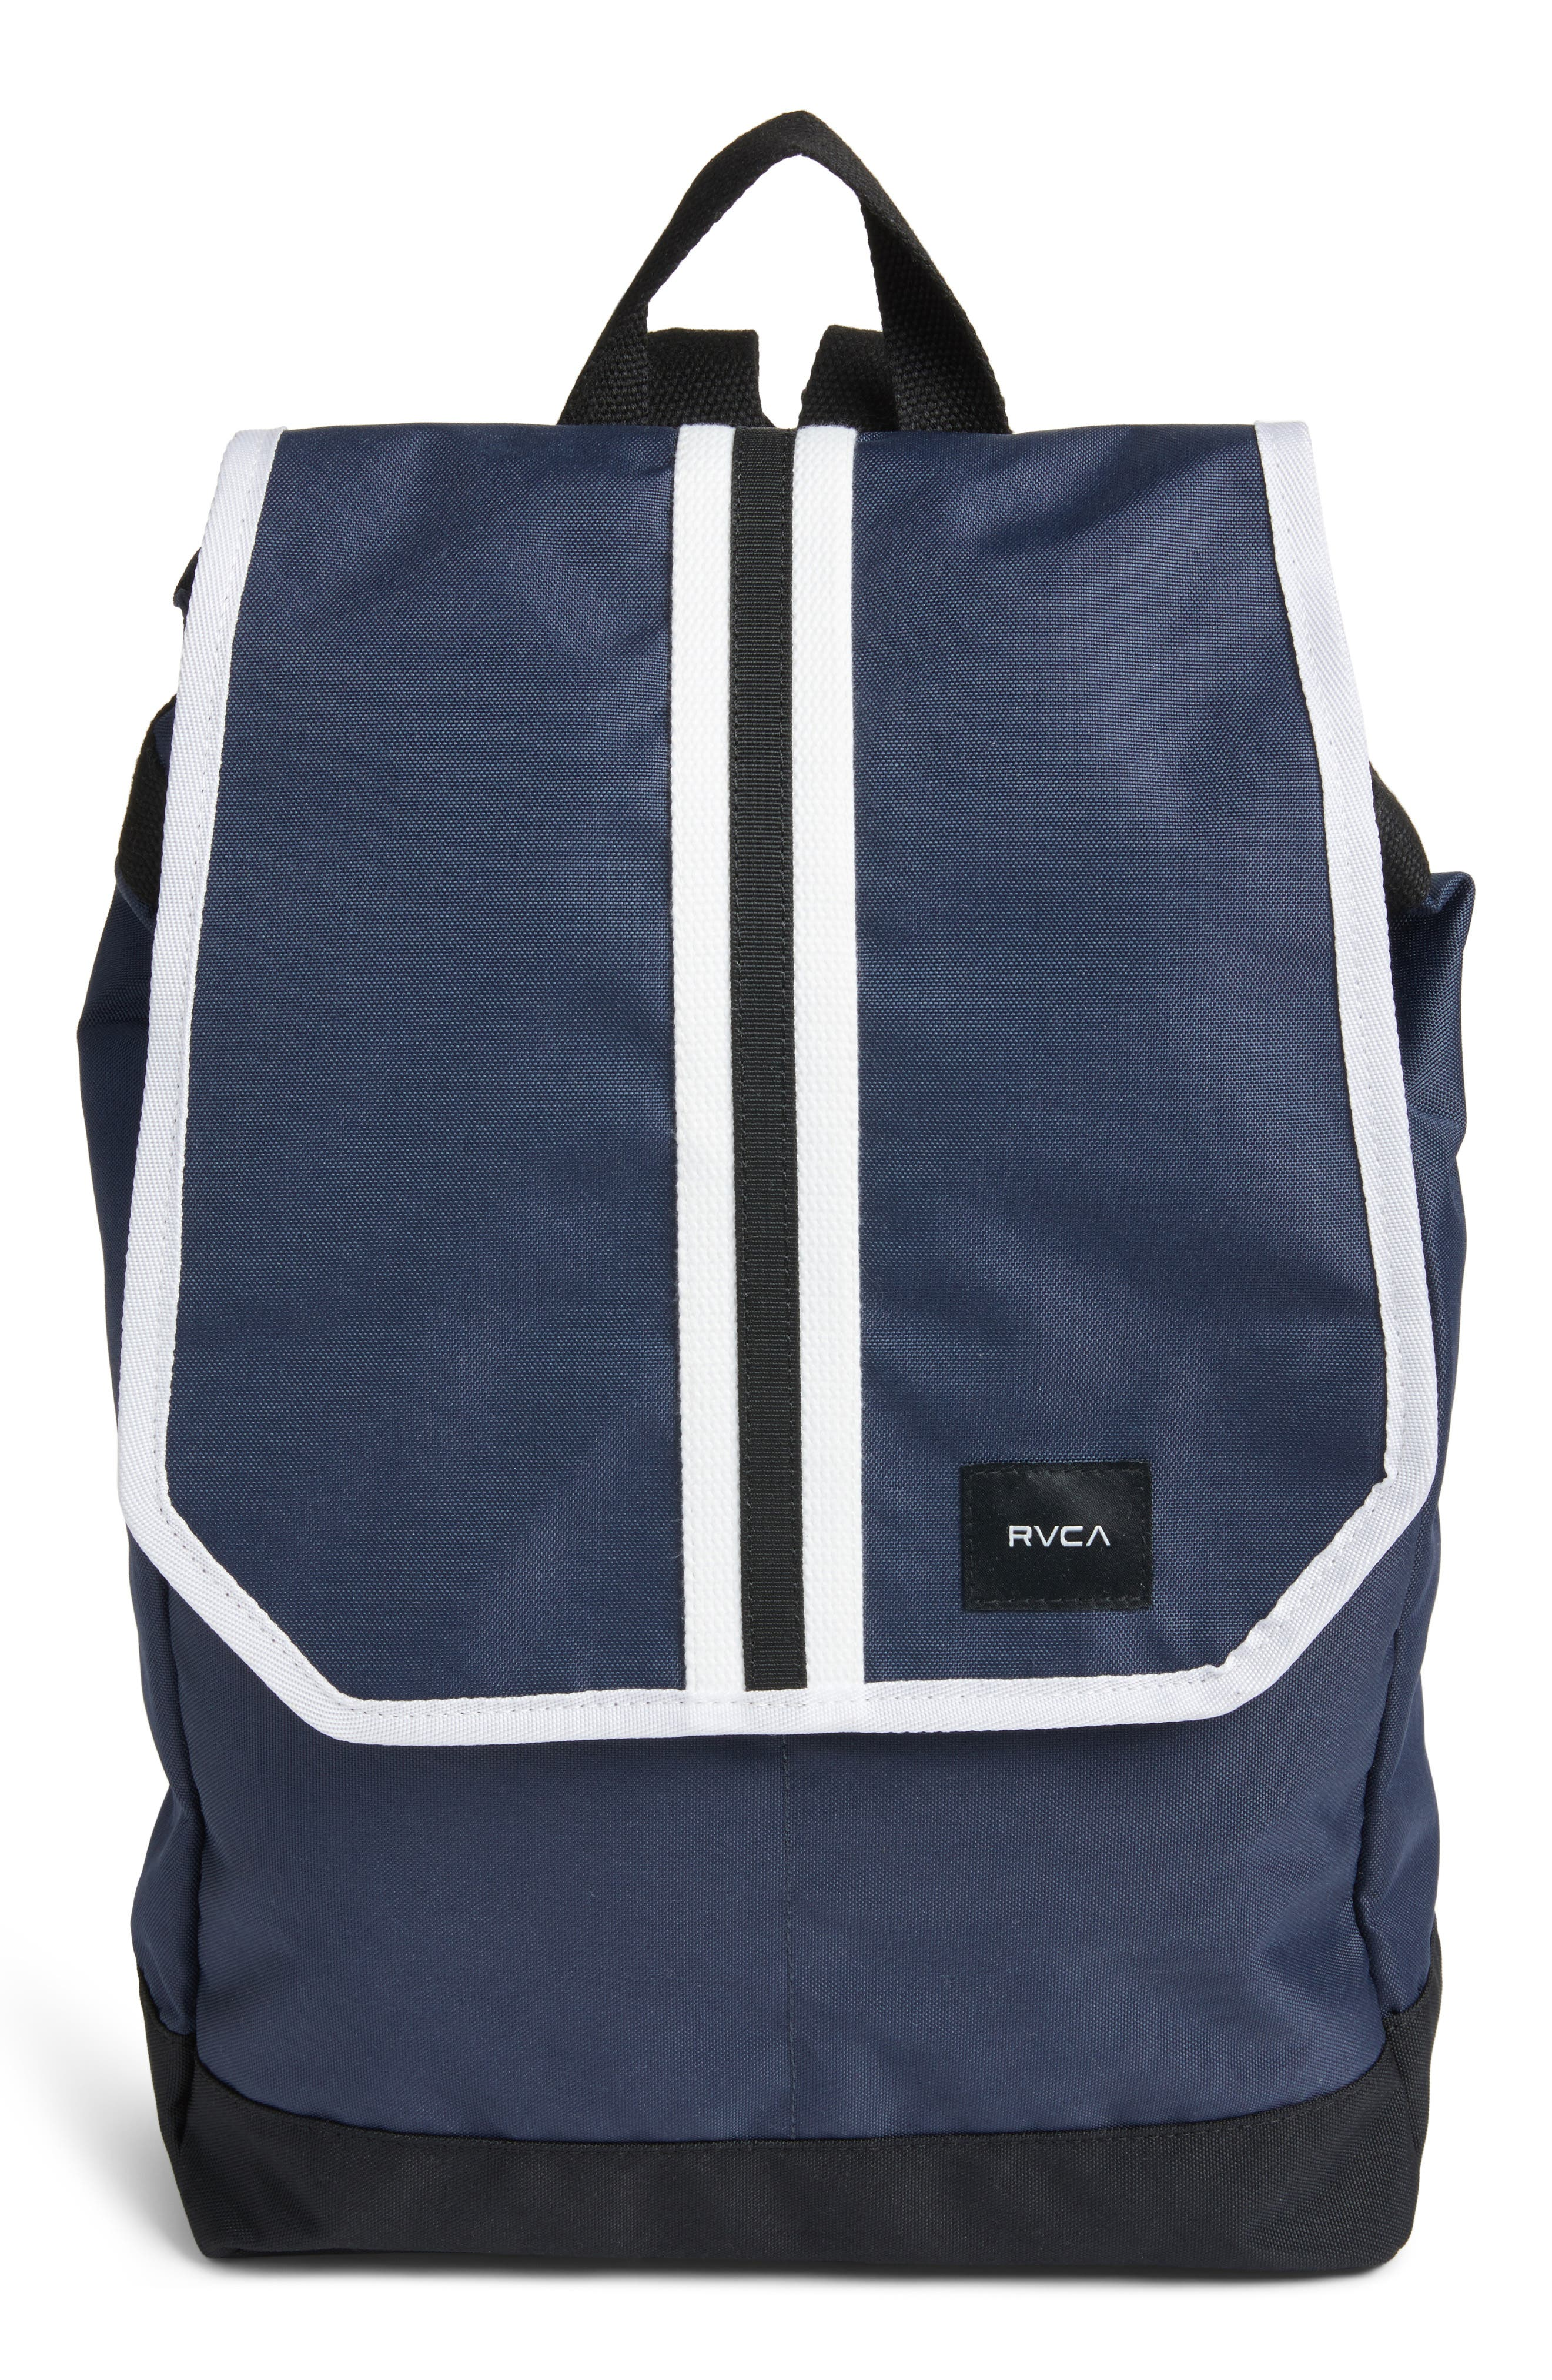 Dazed Backpack,                             Main thumbnail 1, color,                             466